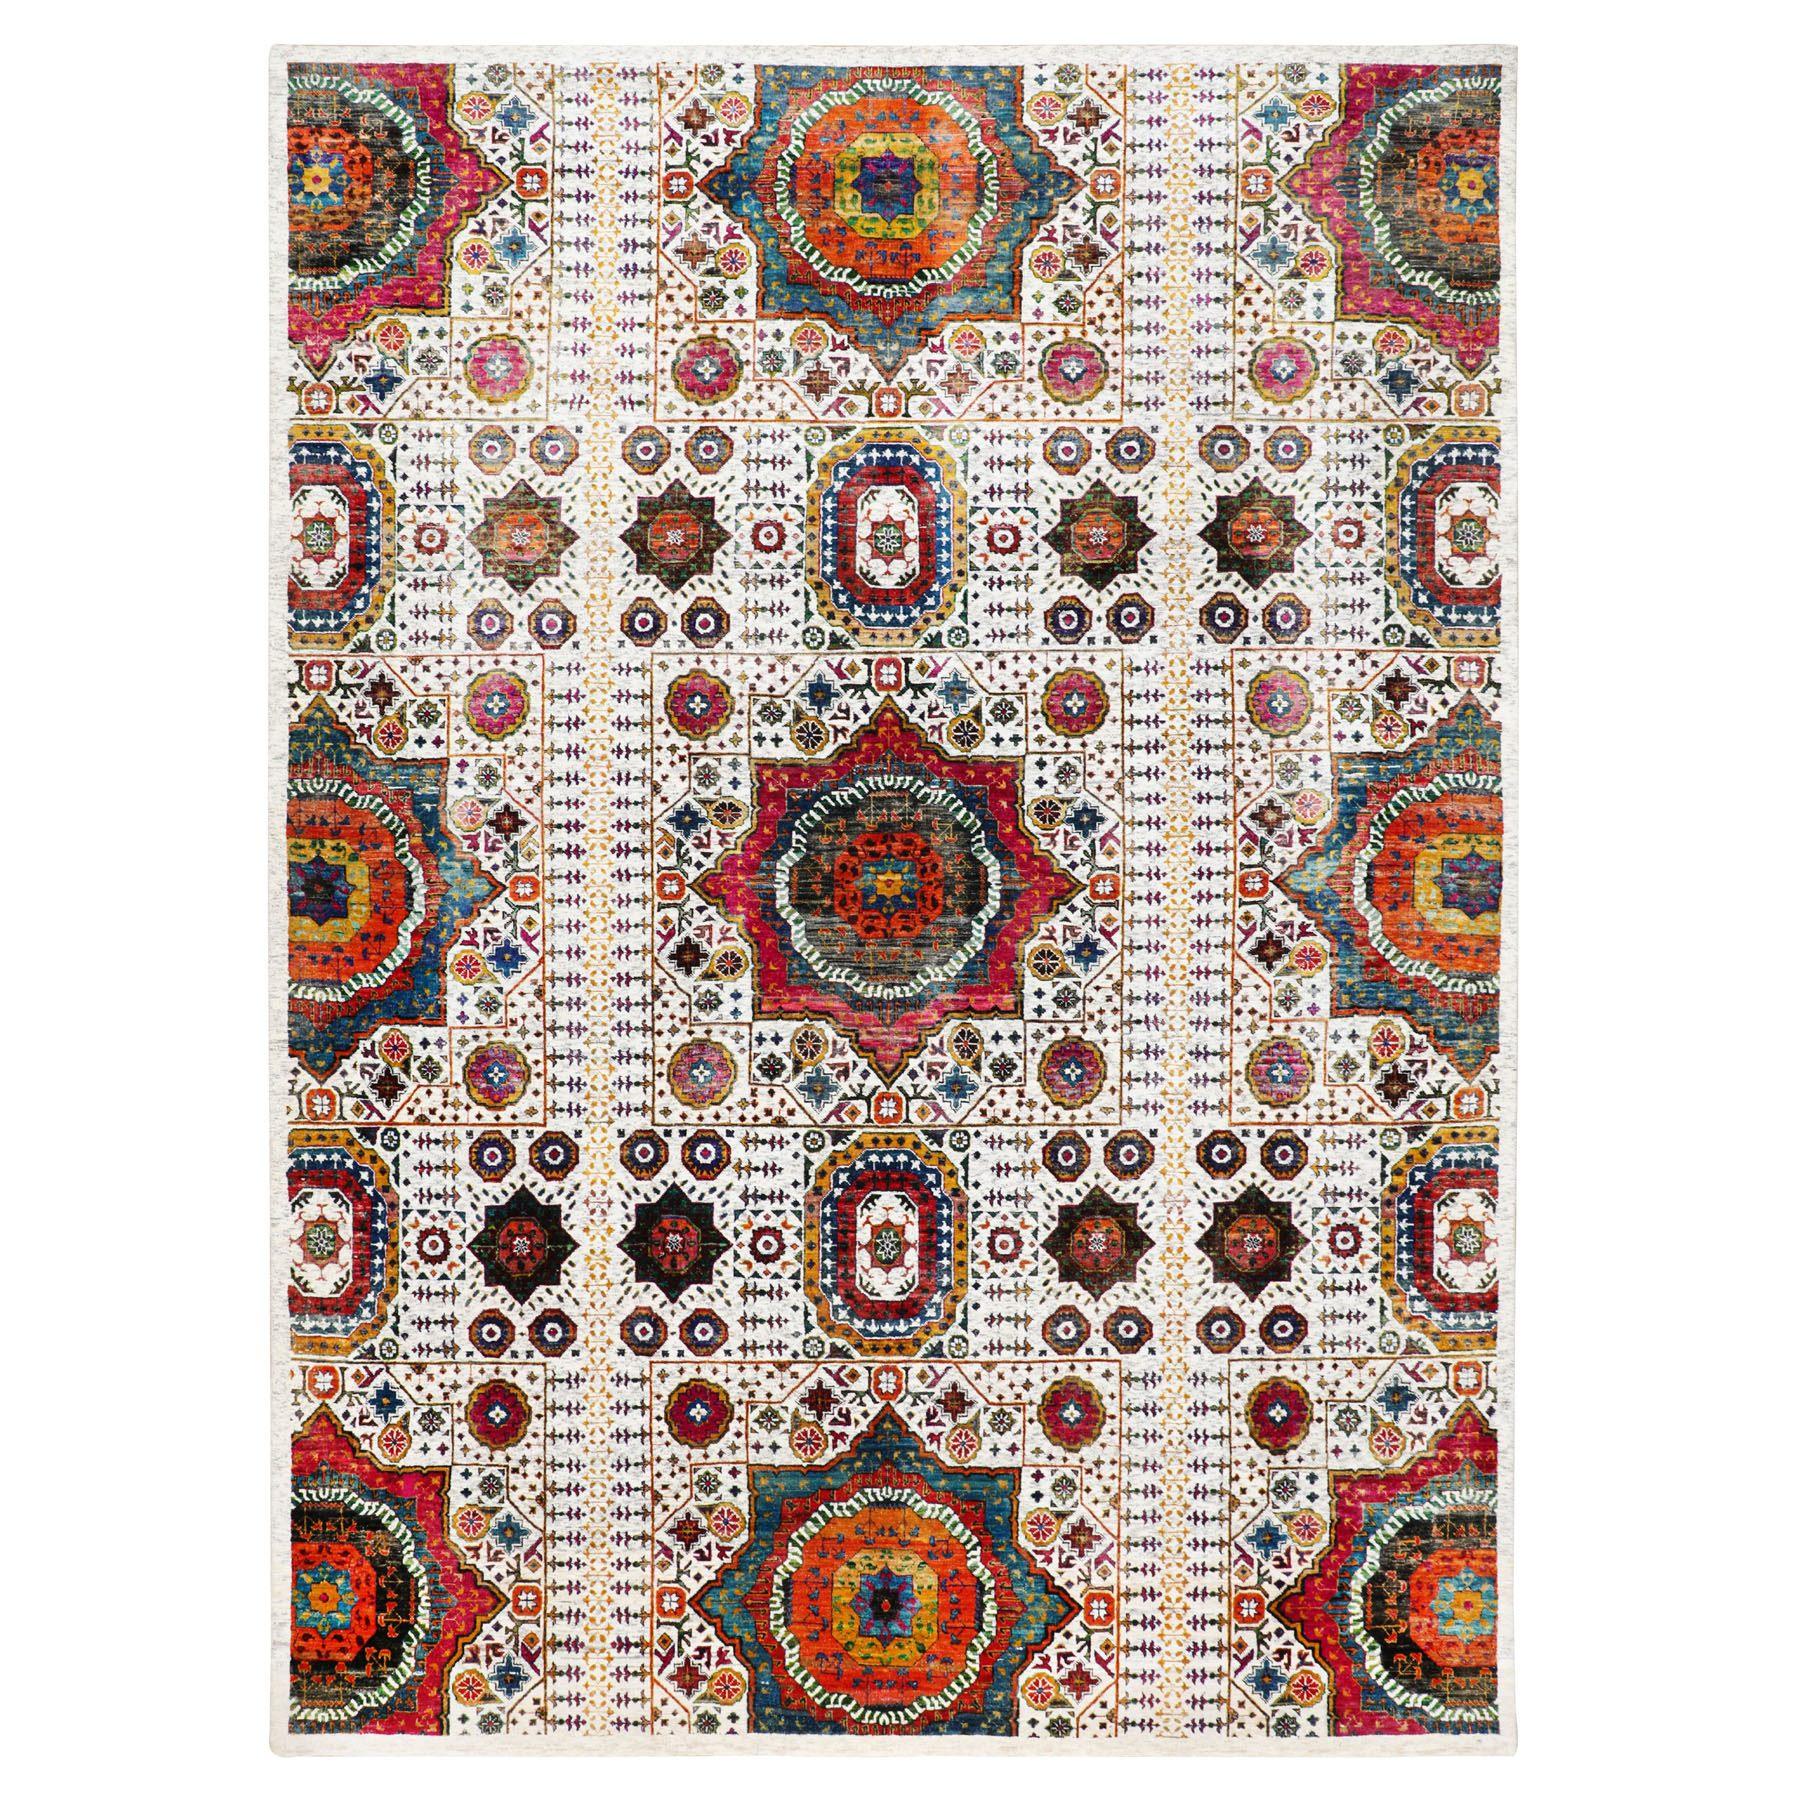 "8'8""x12'1"" Ivory Sari Silk With Textured Wool Mamluk Design Hand Knotted Oriental Rug"